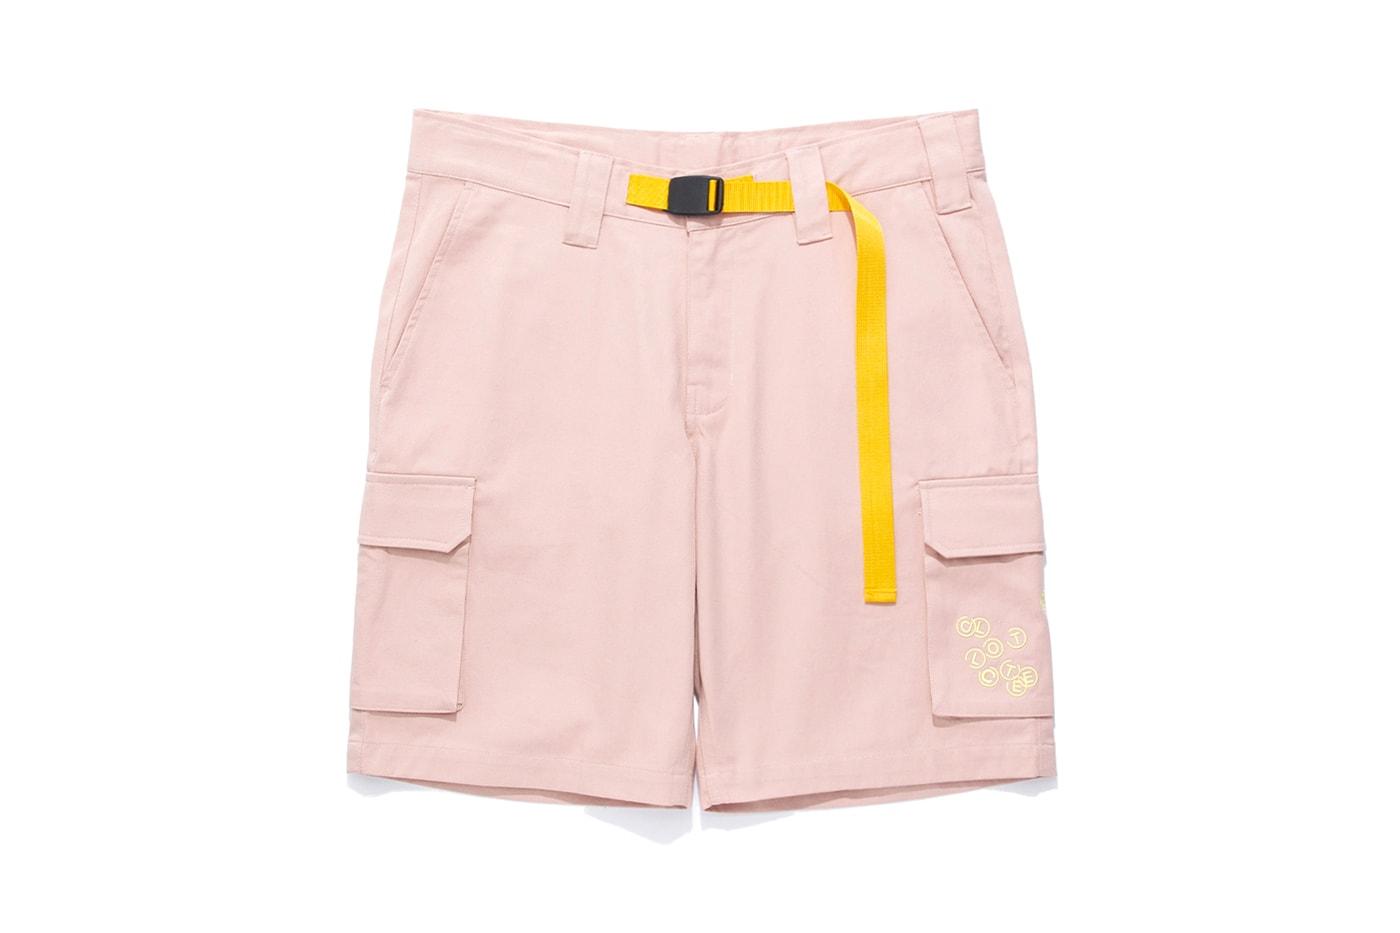 Supreme Spring Summer 2020 Week 10 Release List Palace 12 NHS TRI-TO HELP STUPID T-SHIRTS Off White BRANDALISED CLOTTEE CLOT OAMC NOAH Uniqlo Pokemon Daniel Arsham